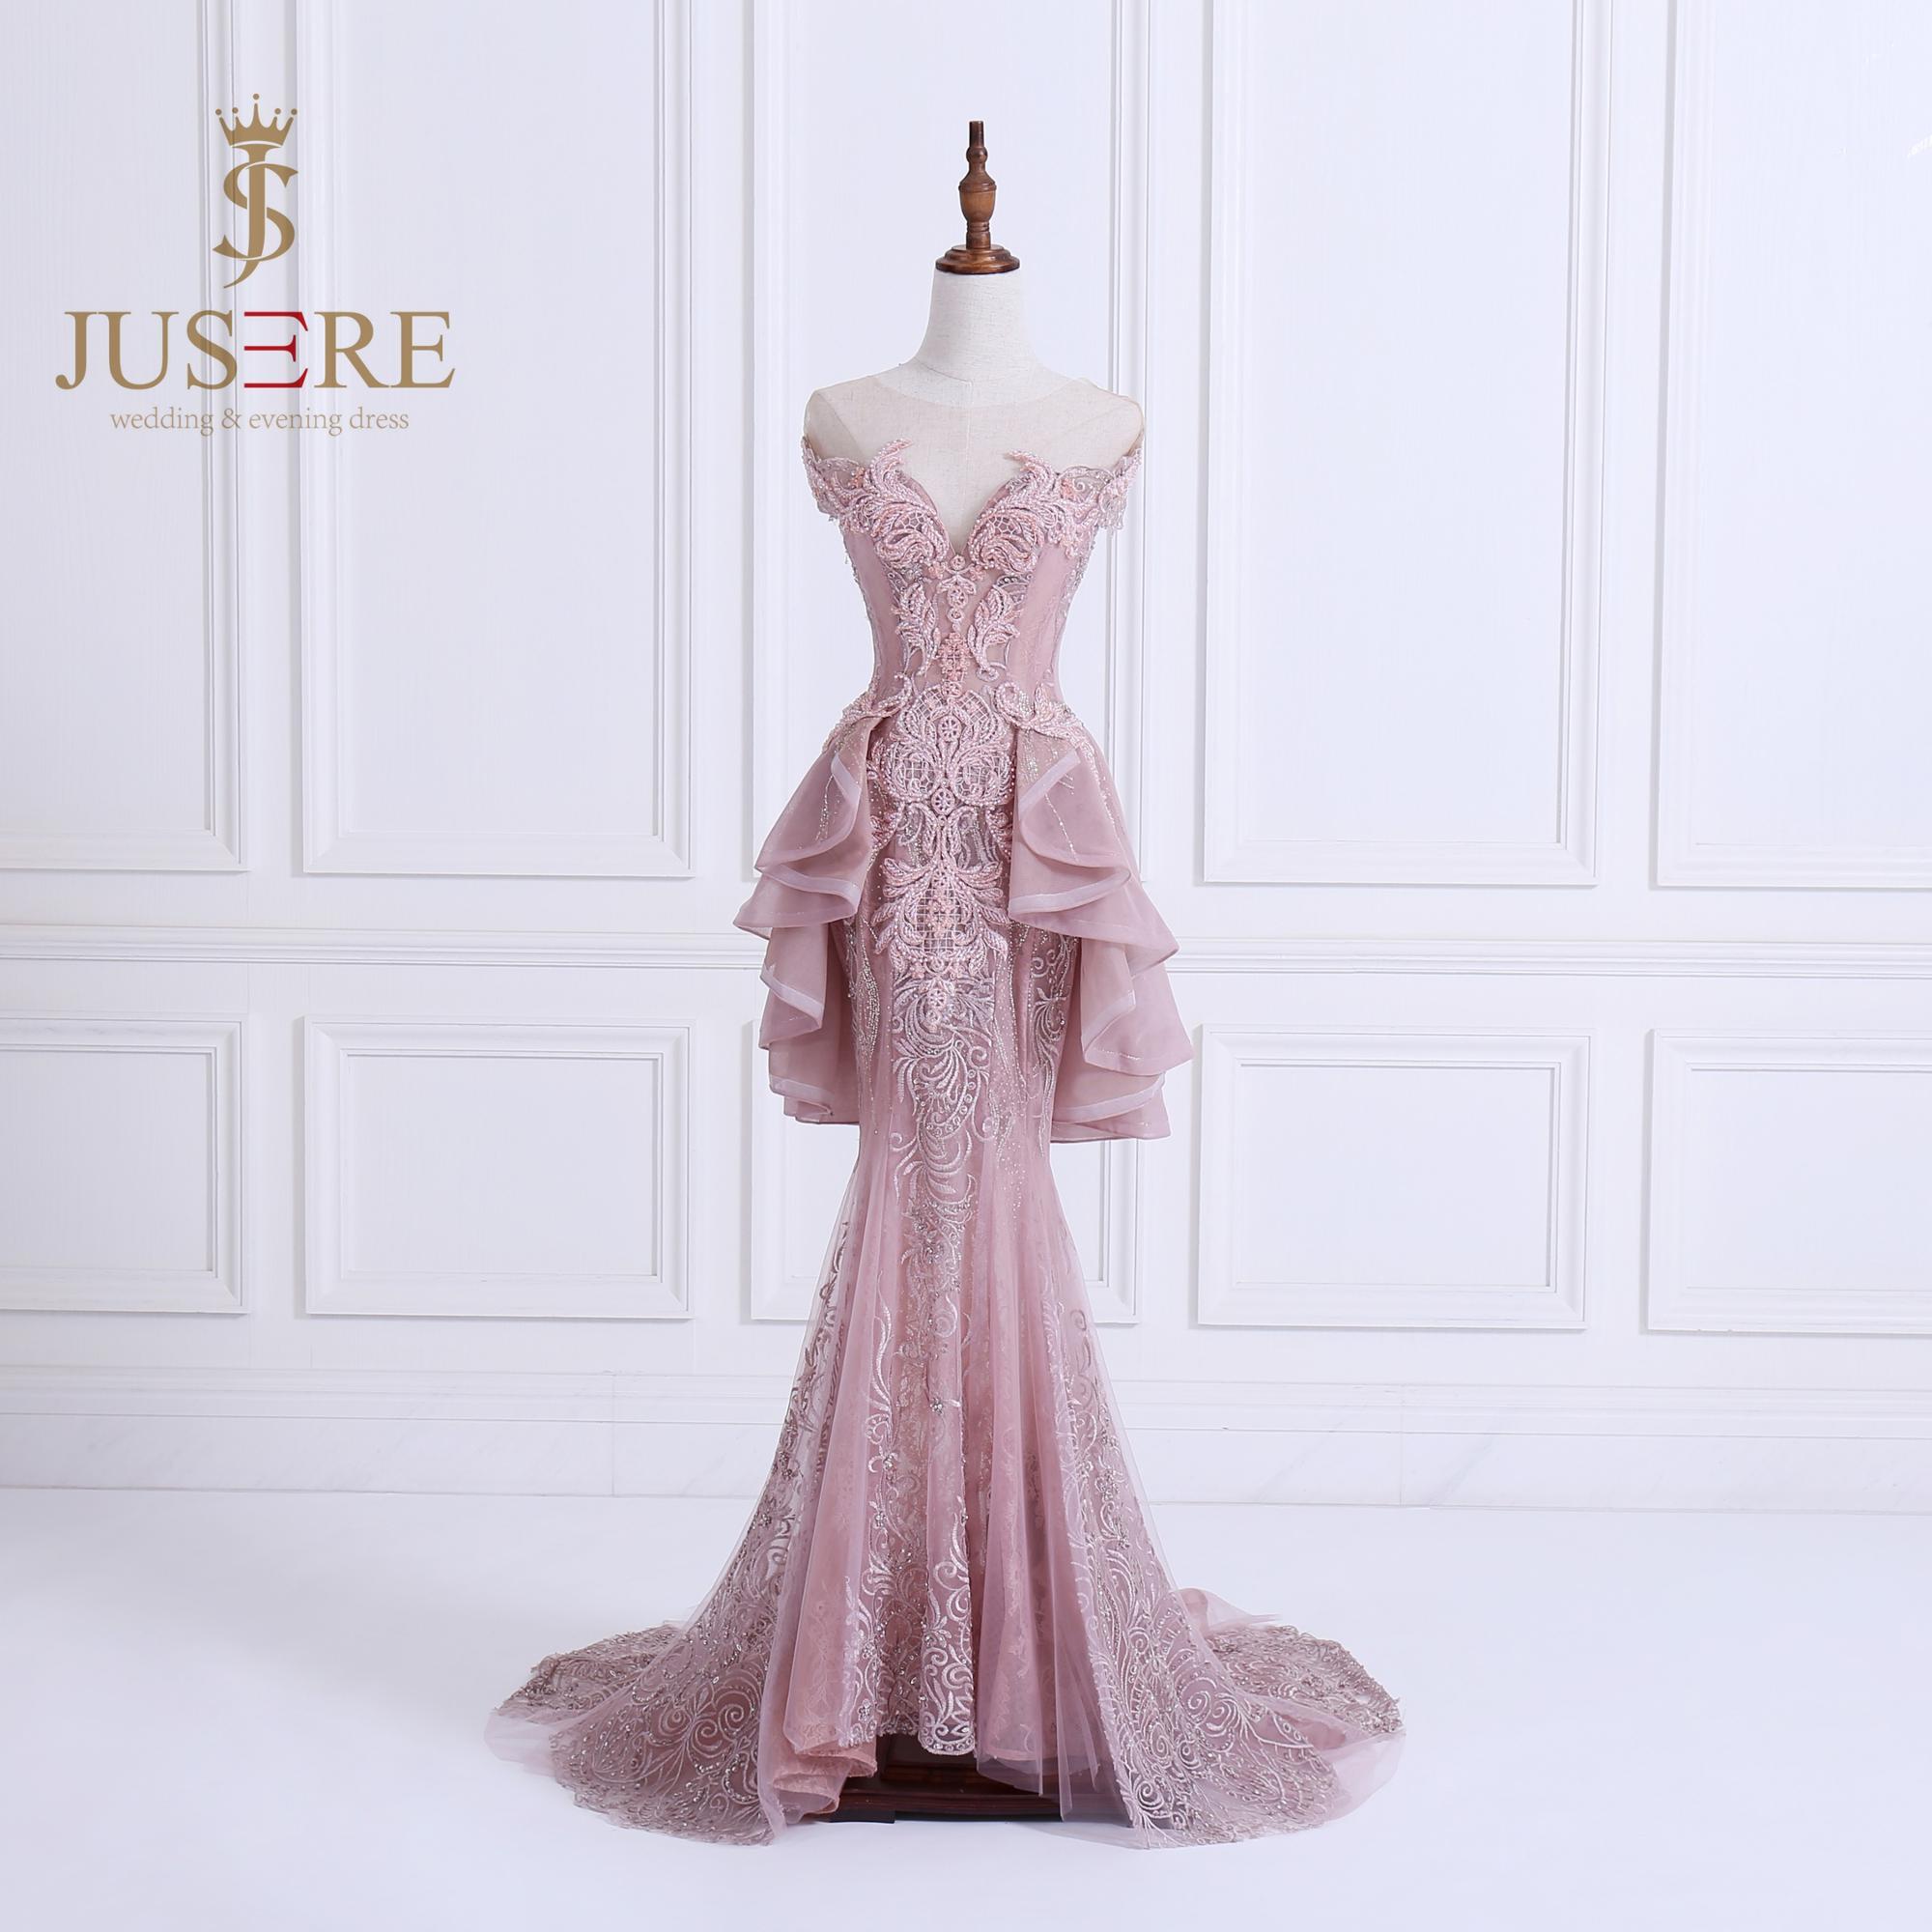 43a45f592 مصادر شركات تصنيع فساتين السهرة في لبنان وفساتين السهرة في لبنان في  Alibaba.com